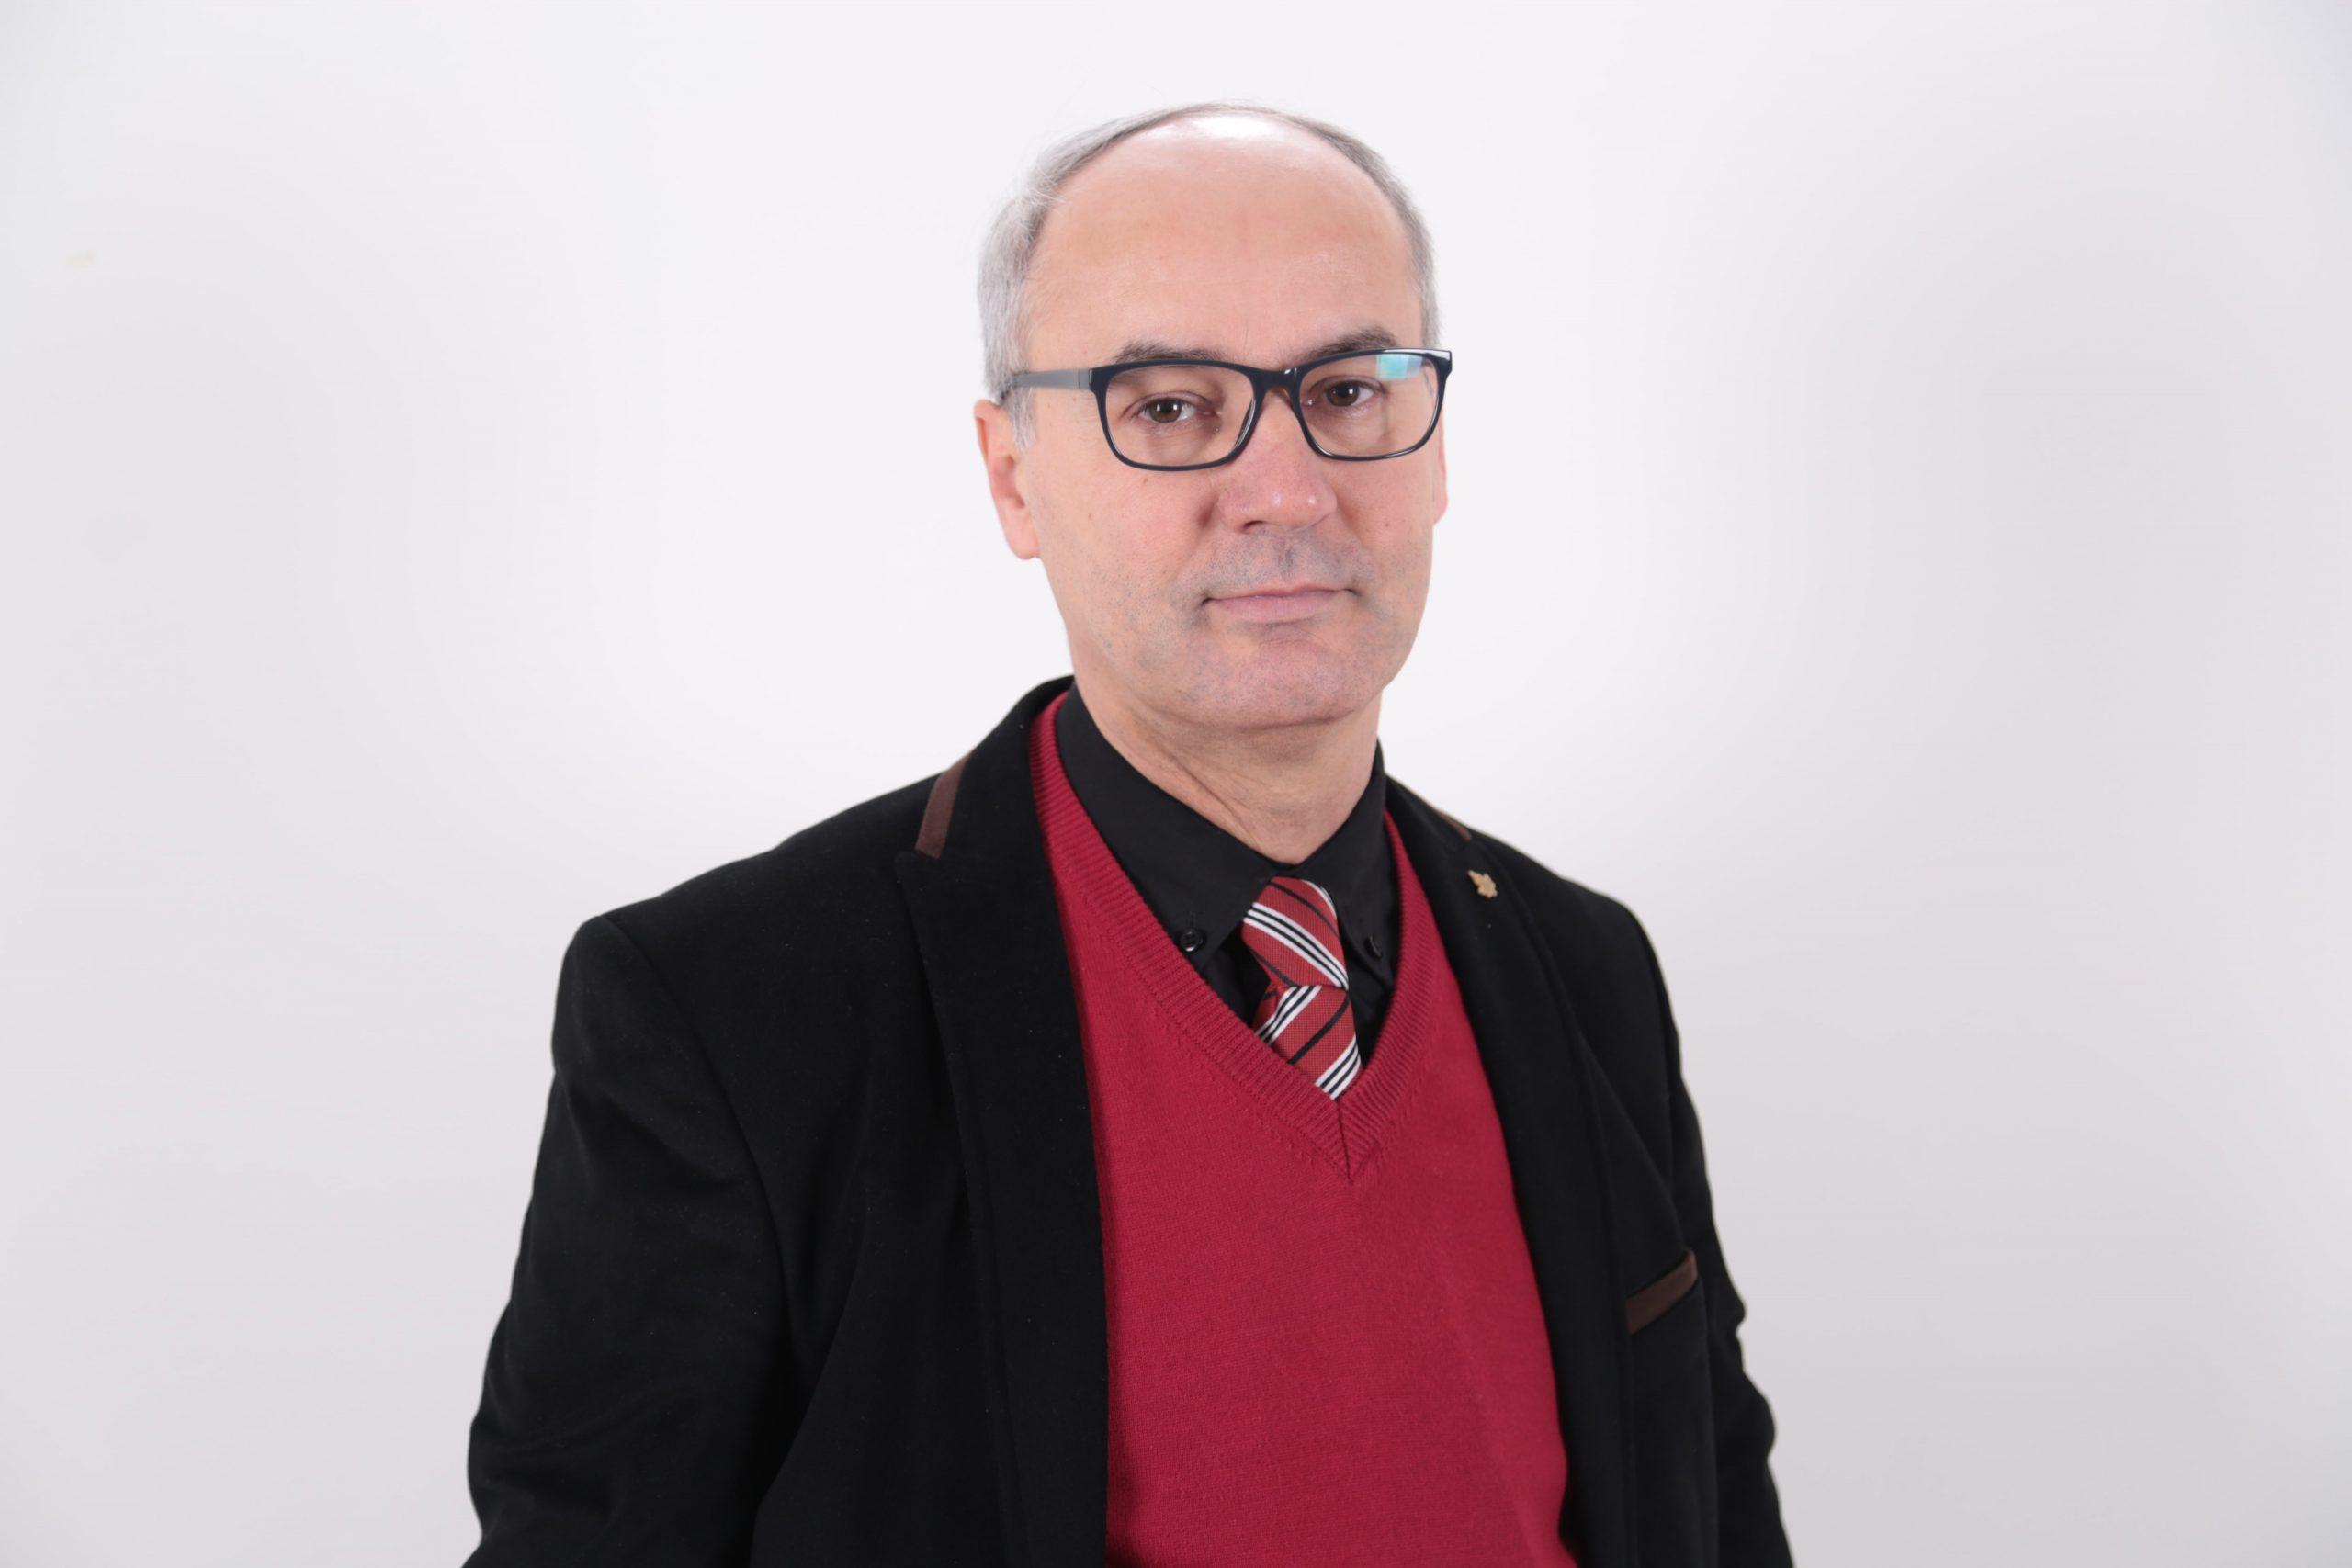 Ibrahim Hajdari